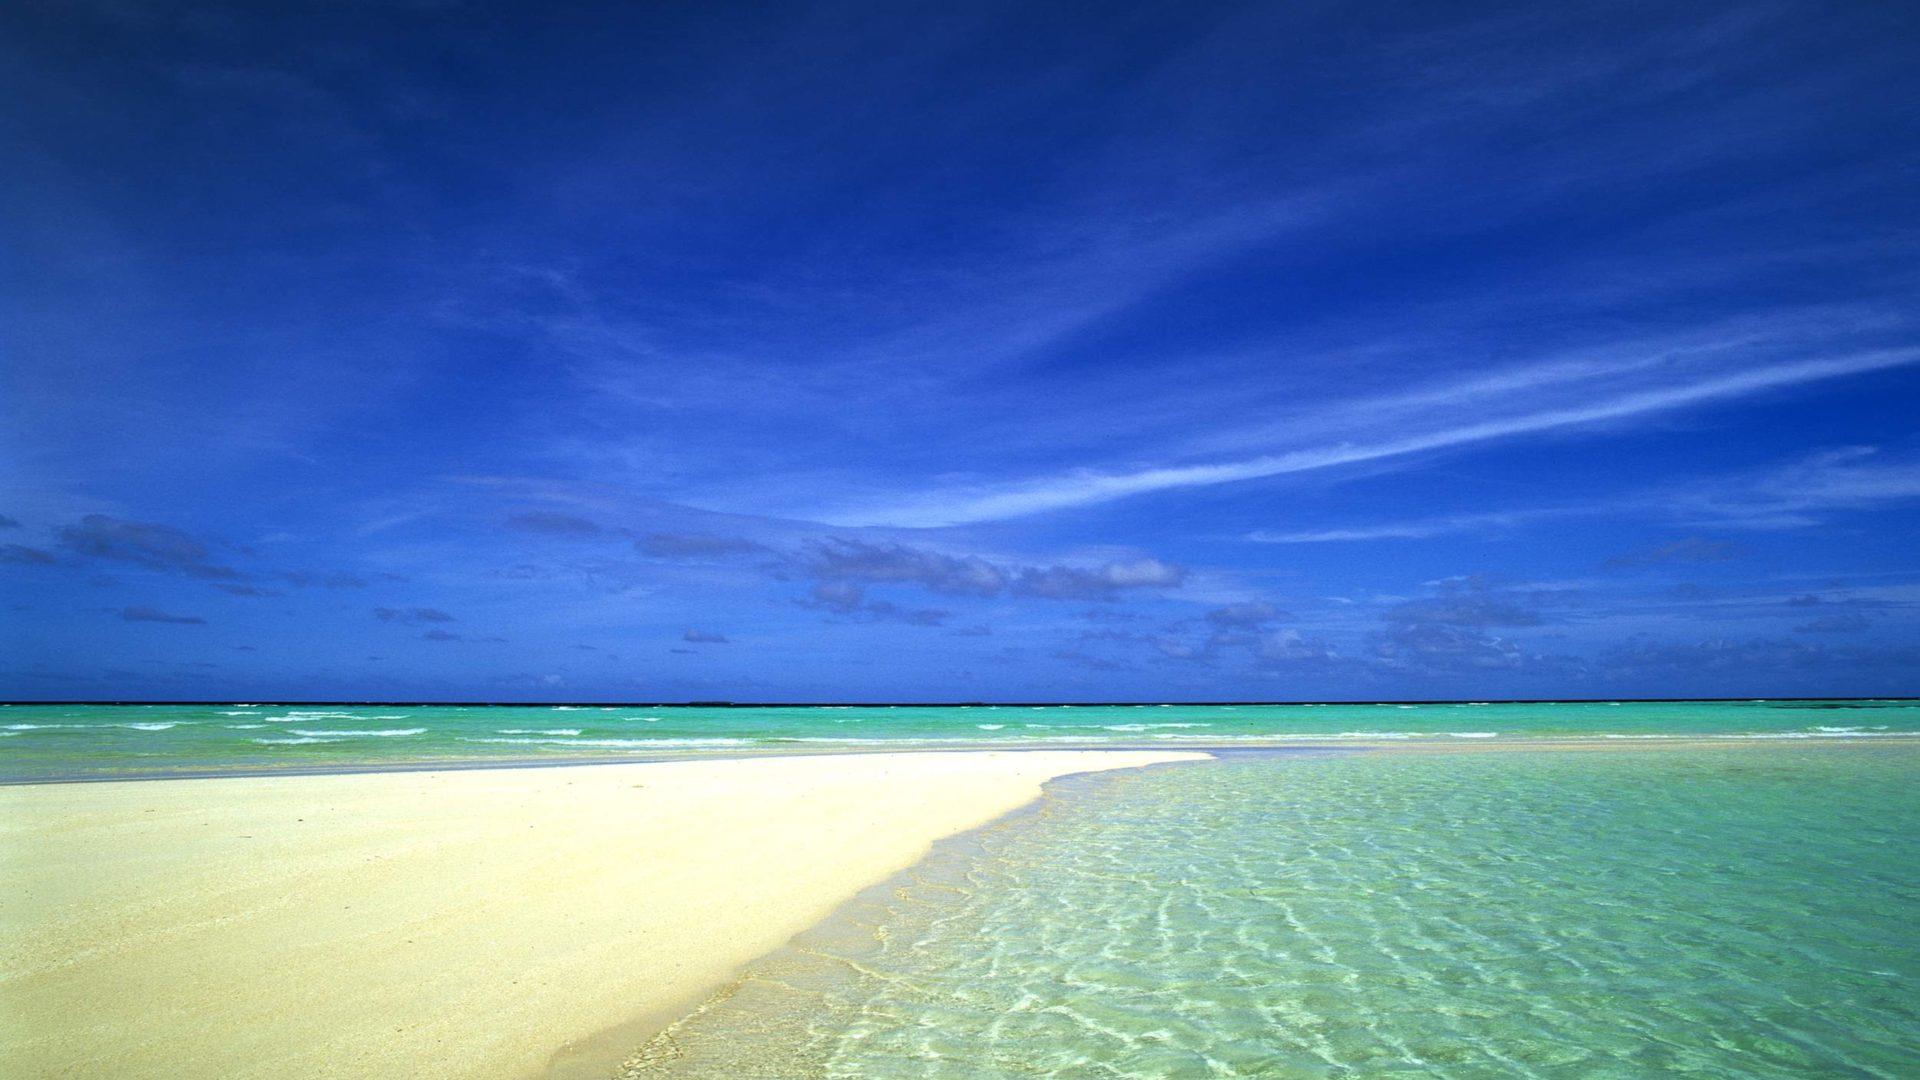 Wallpaper Hd For Windows 10 Free Download Sandy Beach Shallow Blue Sea Sky Summe Wallpapers13 Com